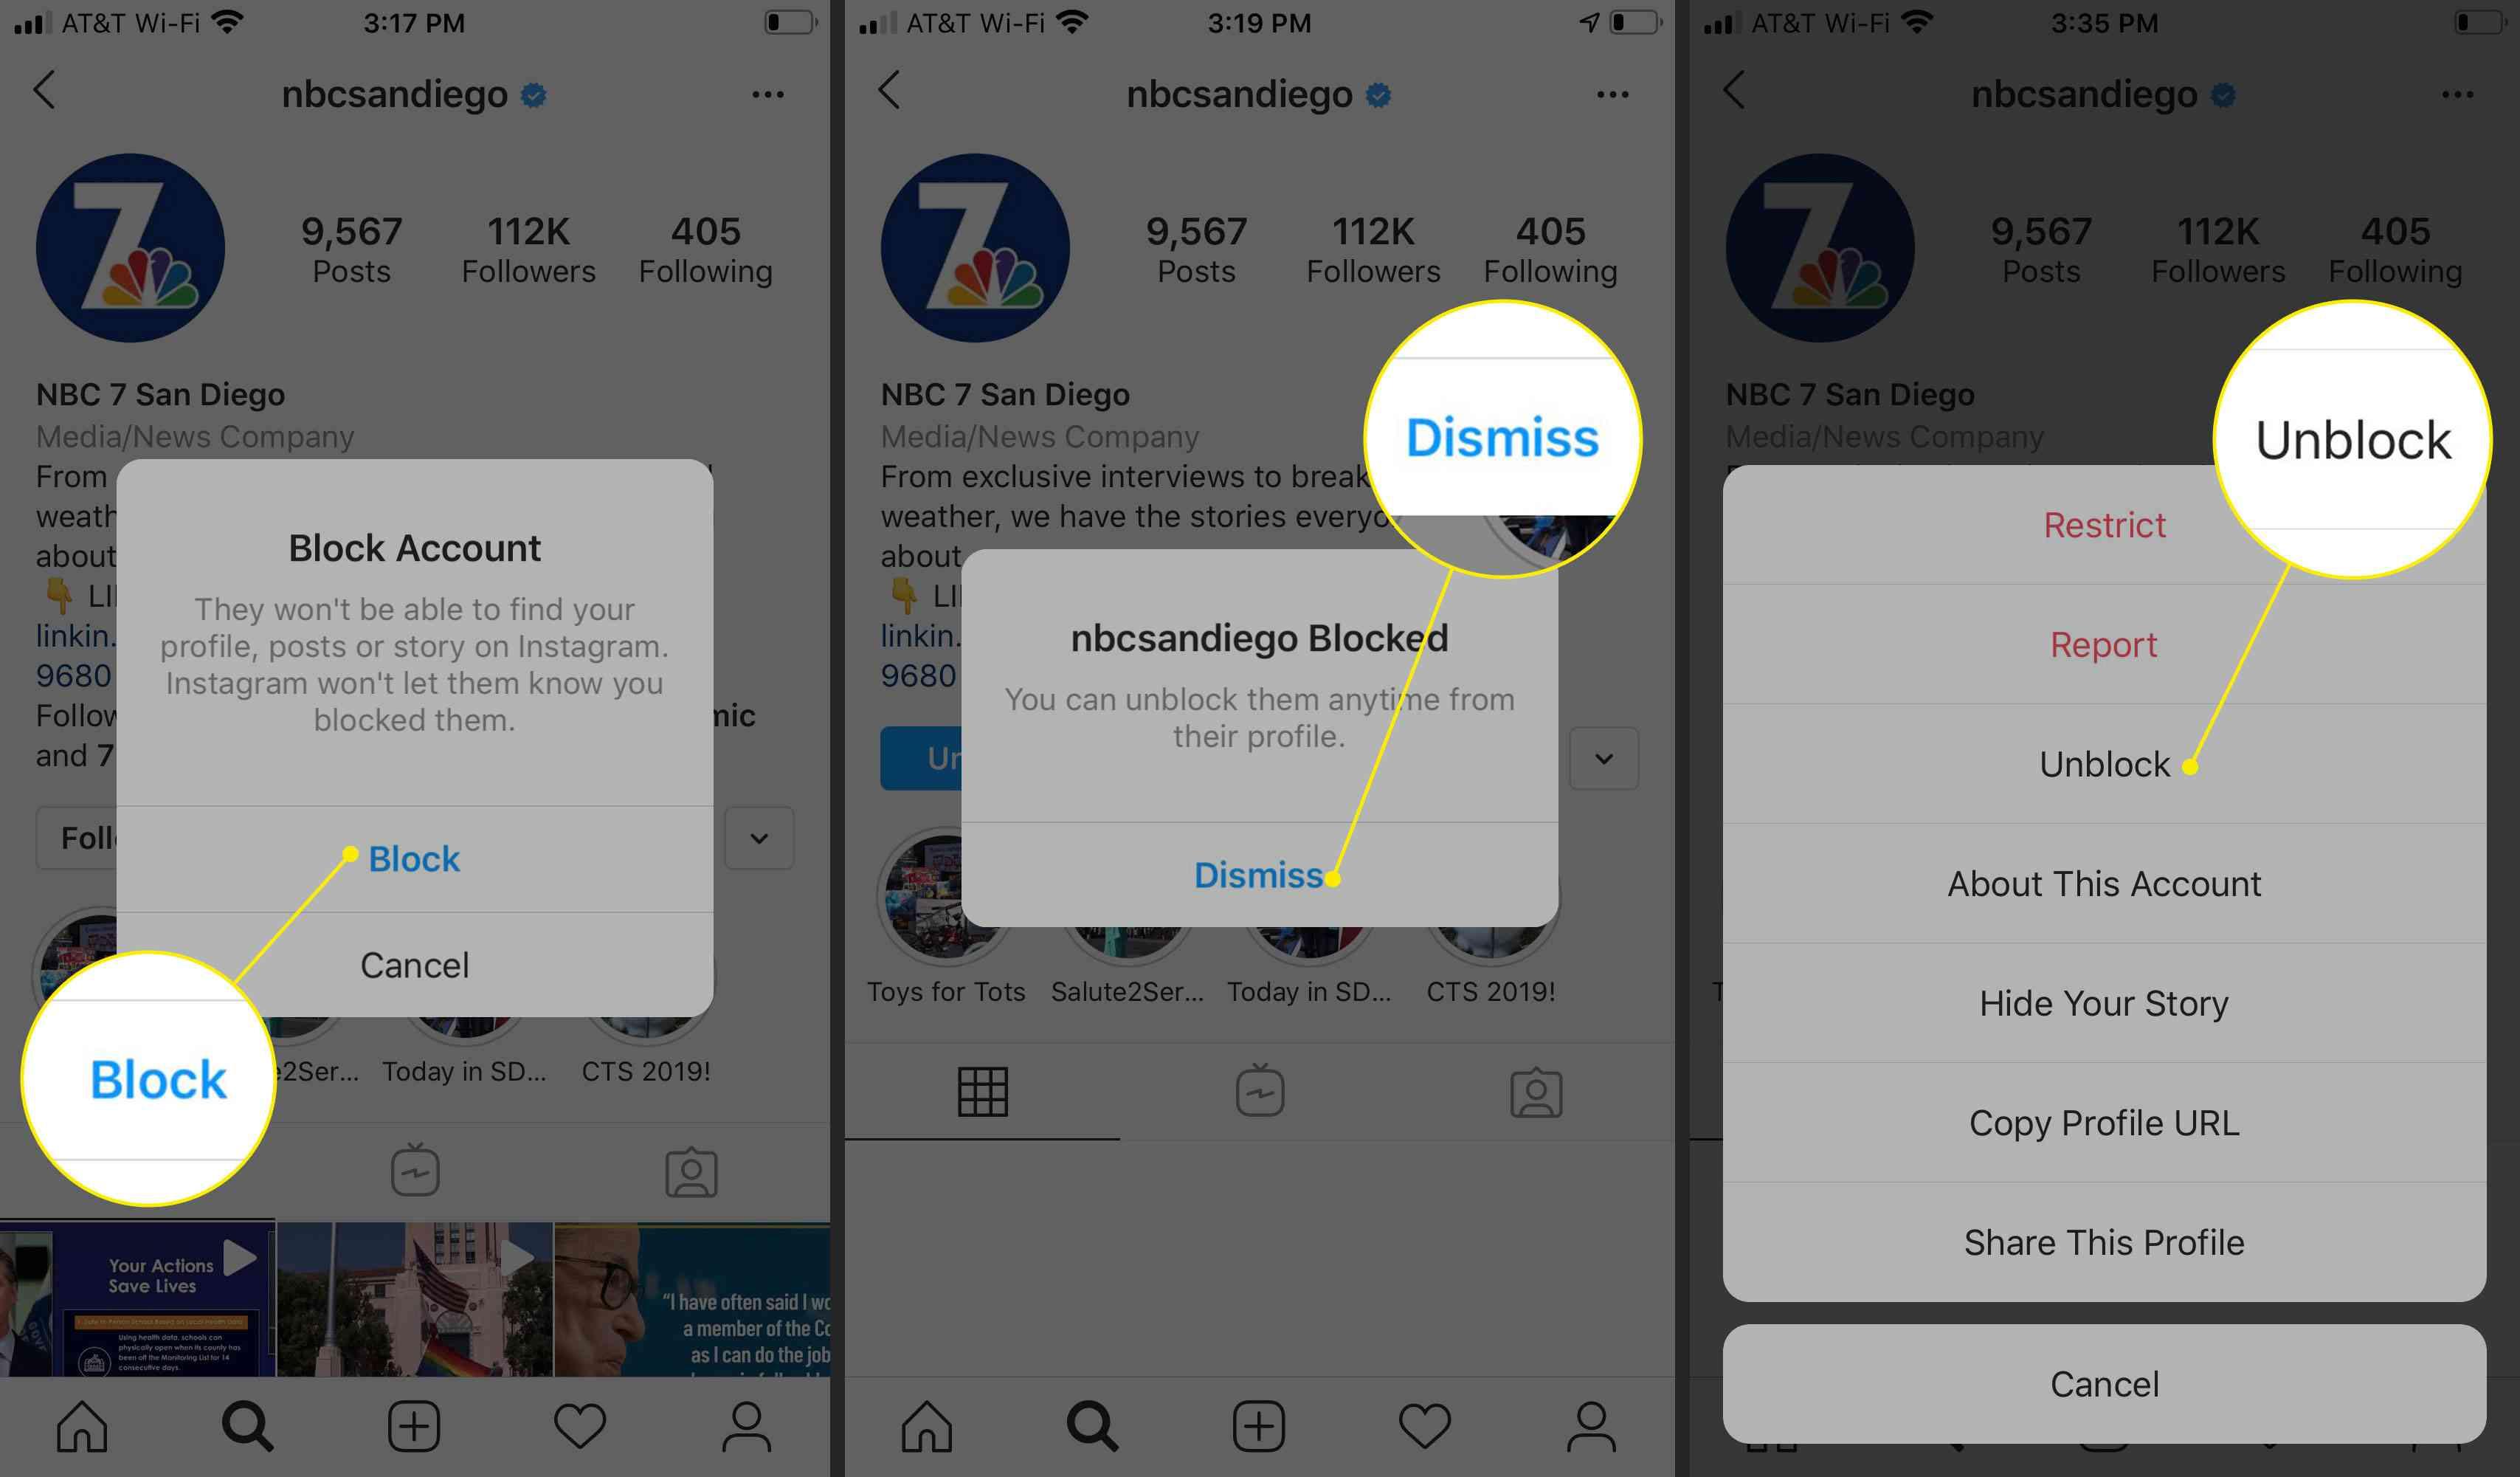 Blocking an account on Instagram